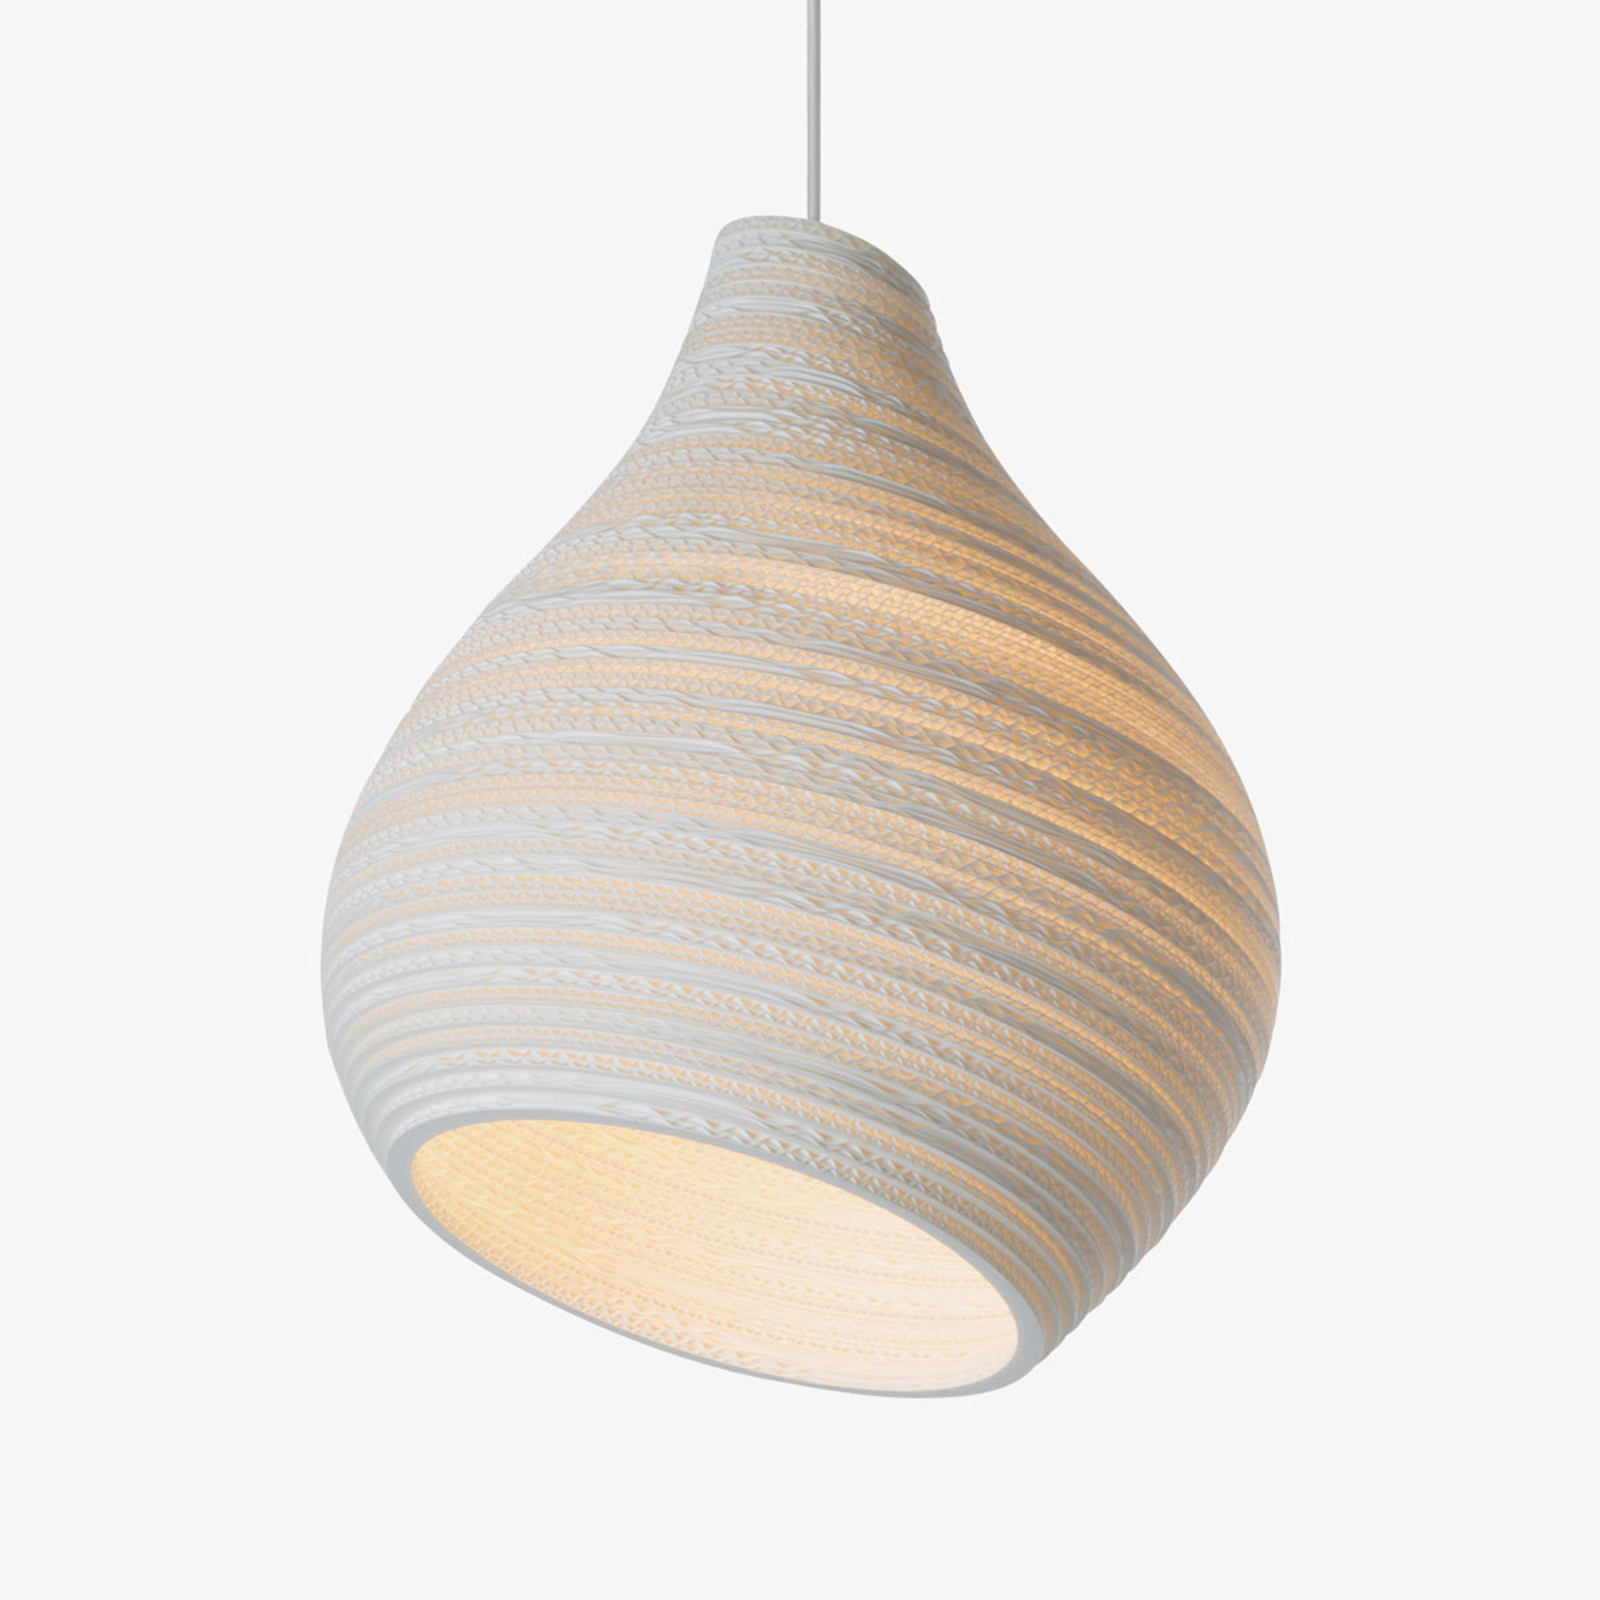 Lampa wisząca Hive biała Ø 38 cm